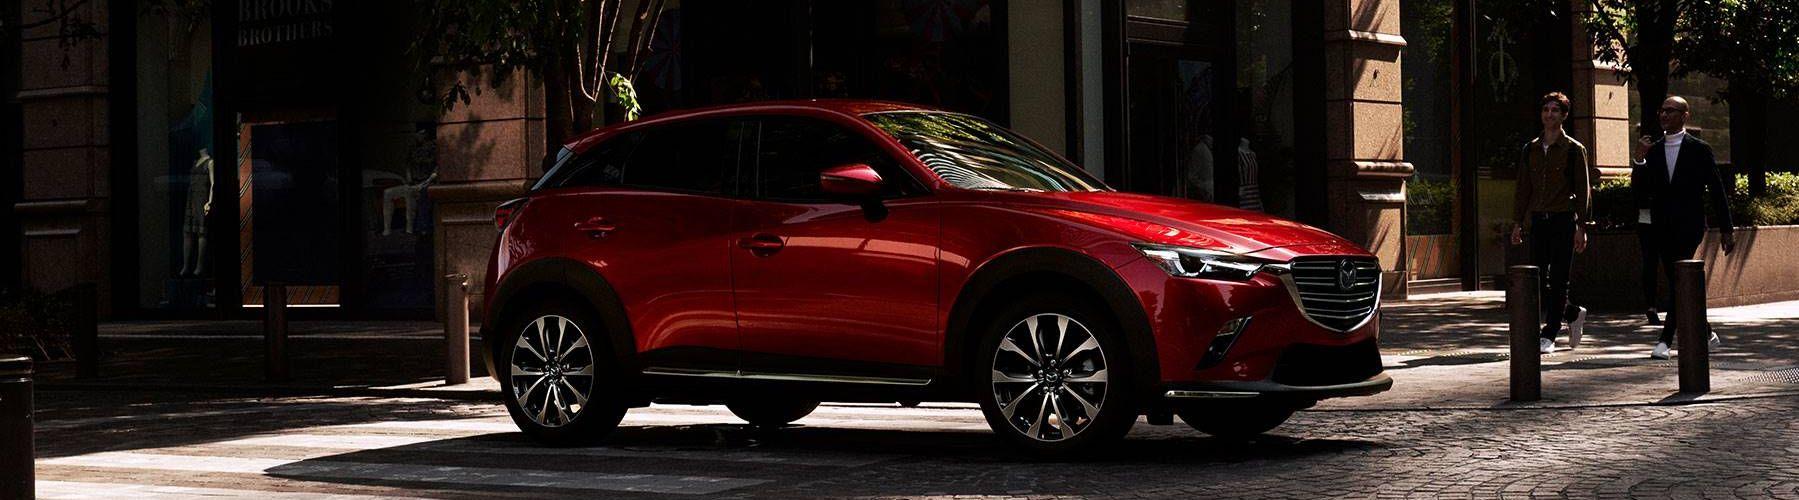 2019 Mazda CX-3 for Sale near Chandler, AZ